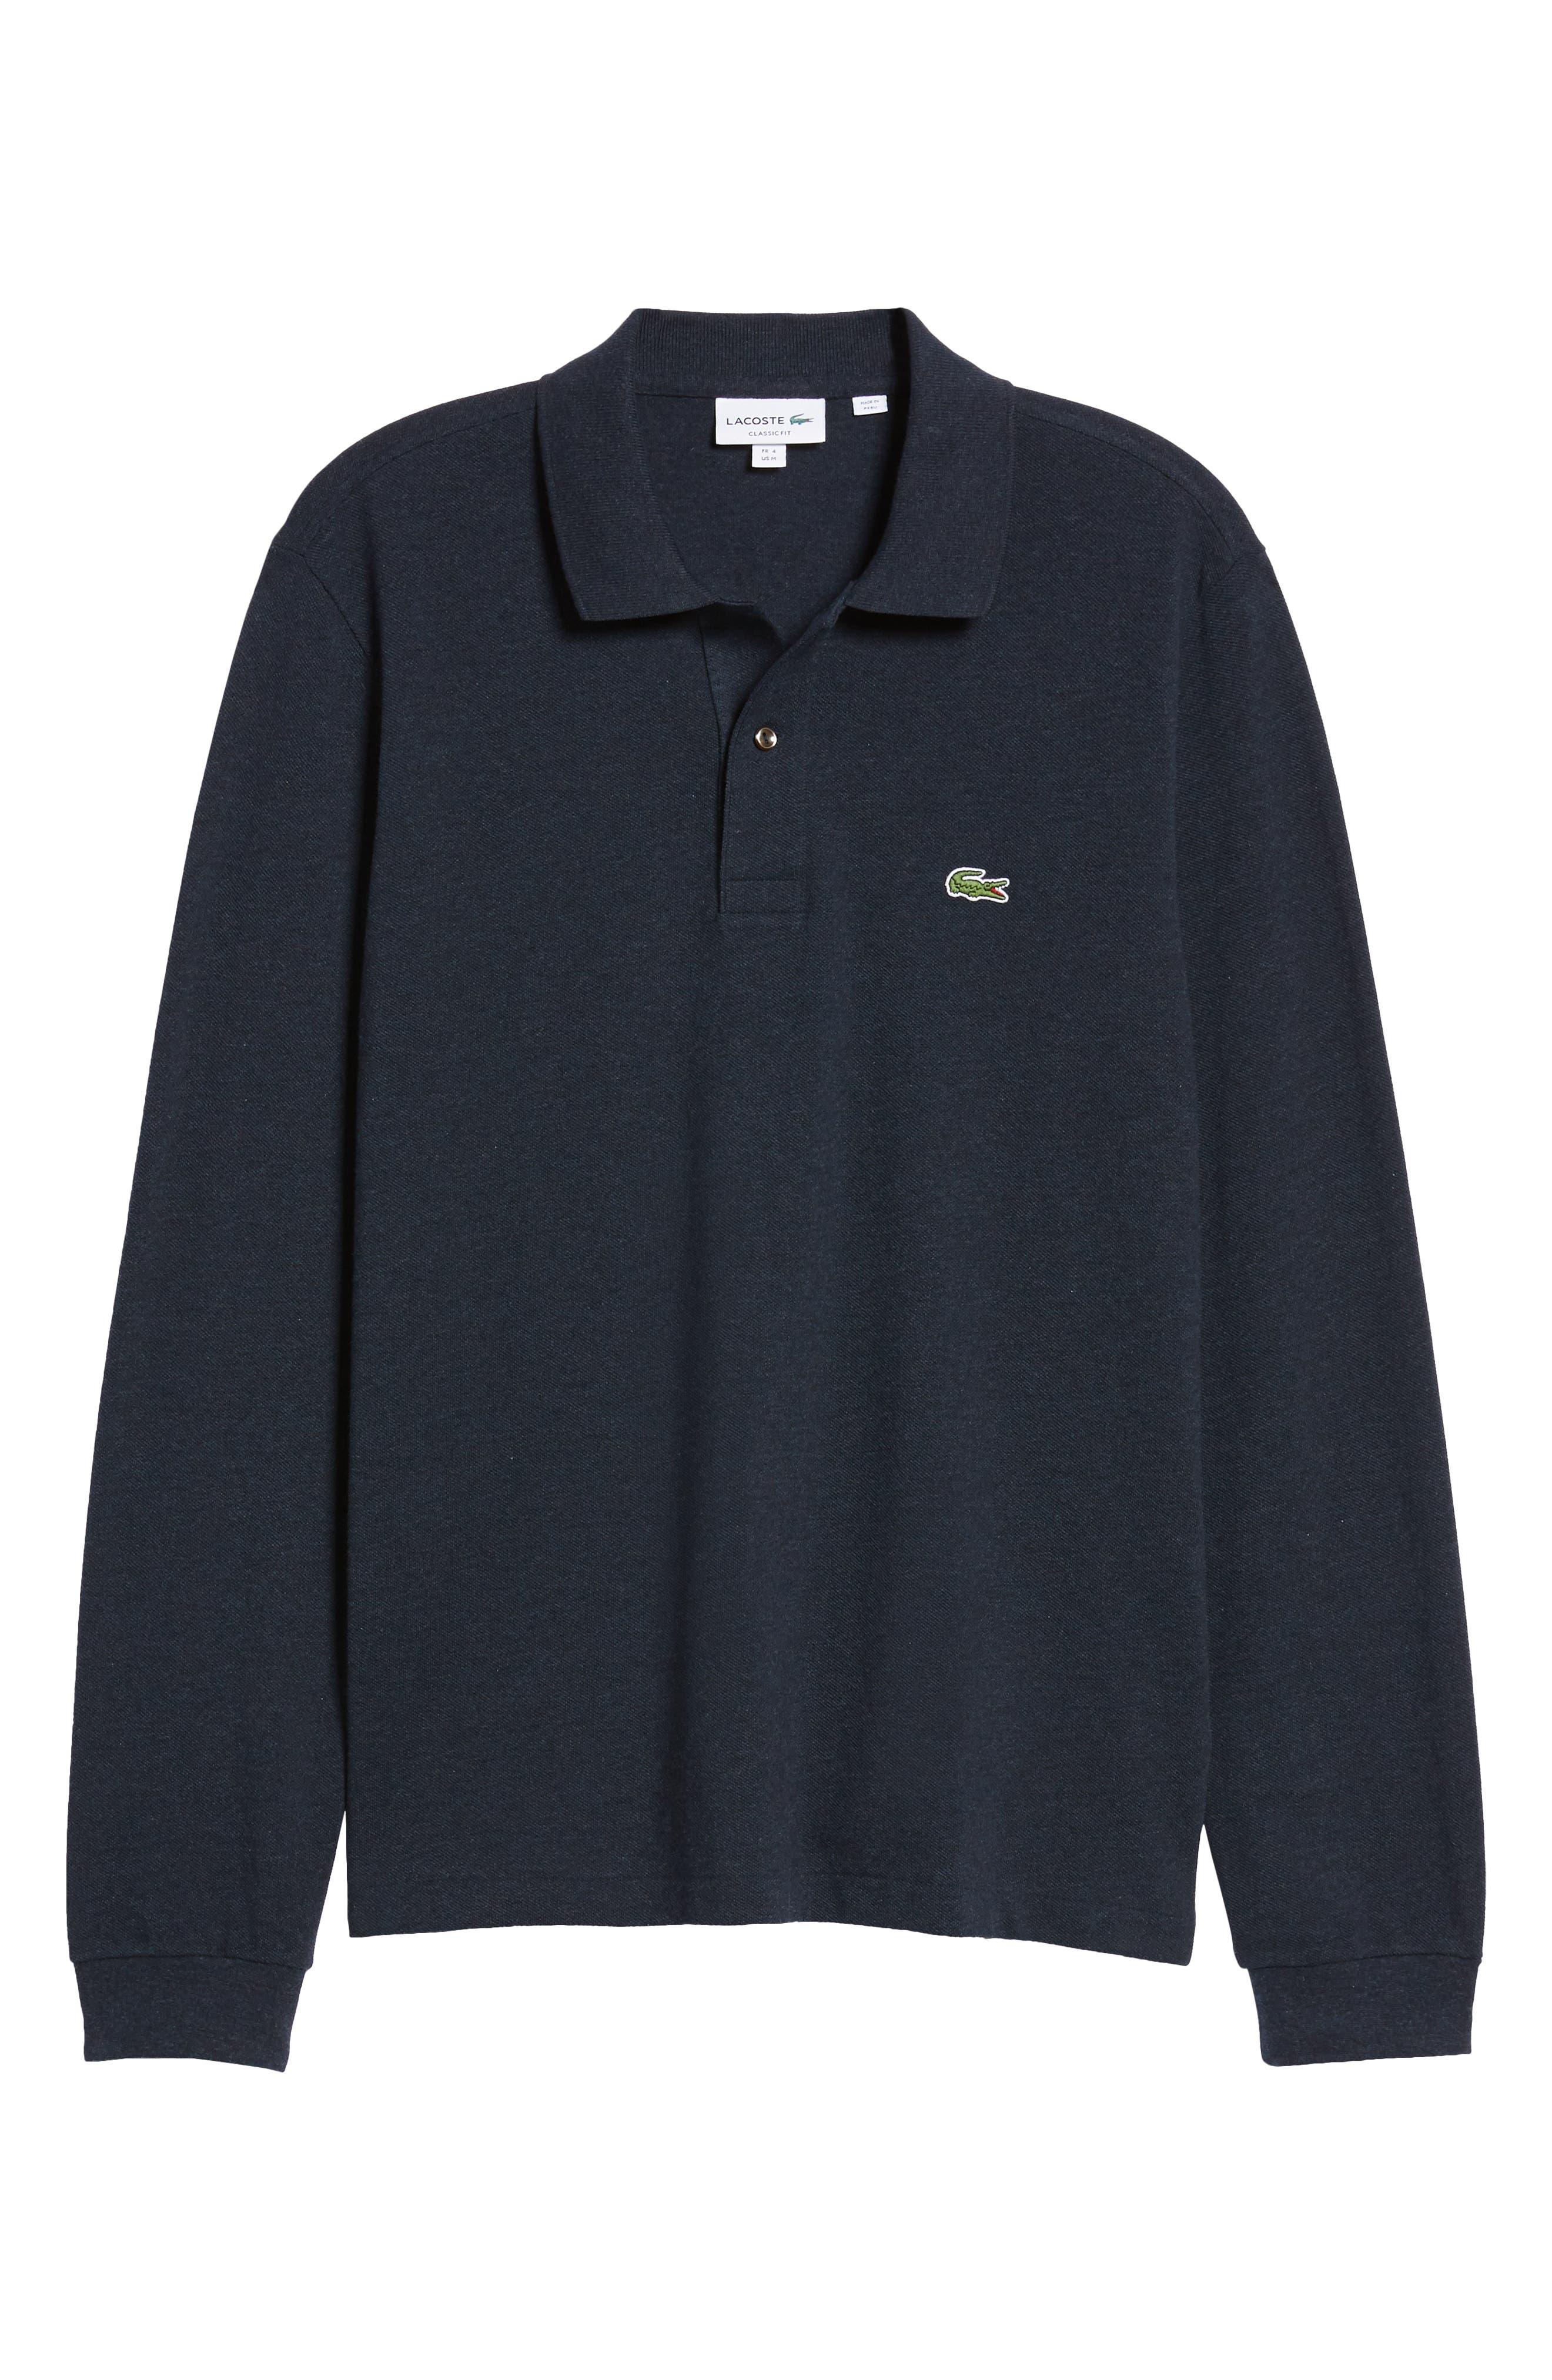 LACOSTE, Long Sleeve Piqué Polo, Alternate thumbnail 6, color, ECLIPSE BLUE CHINE